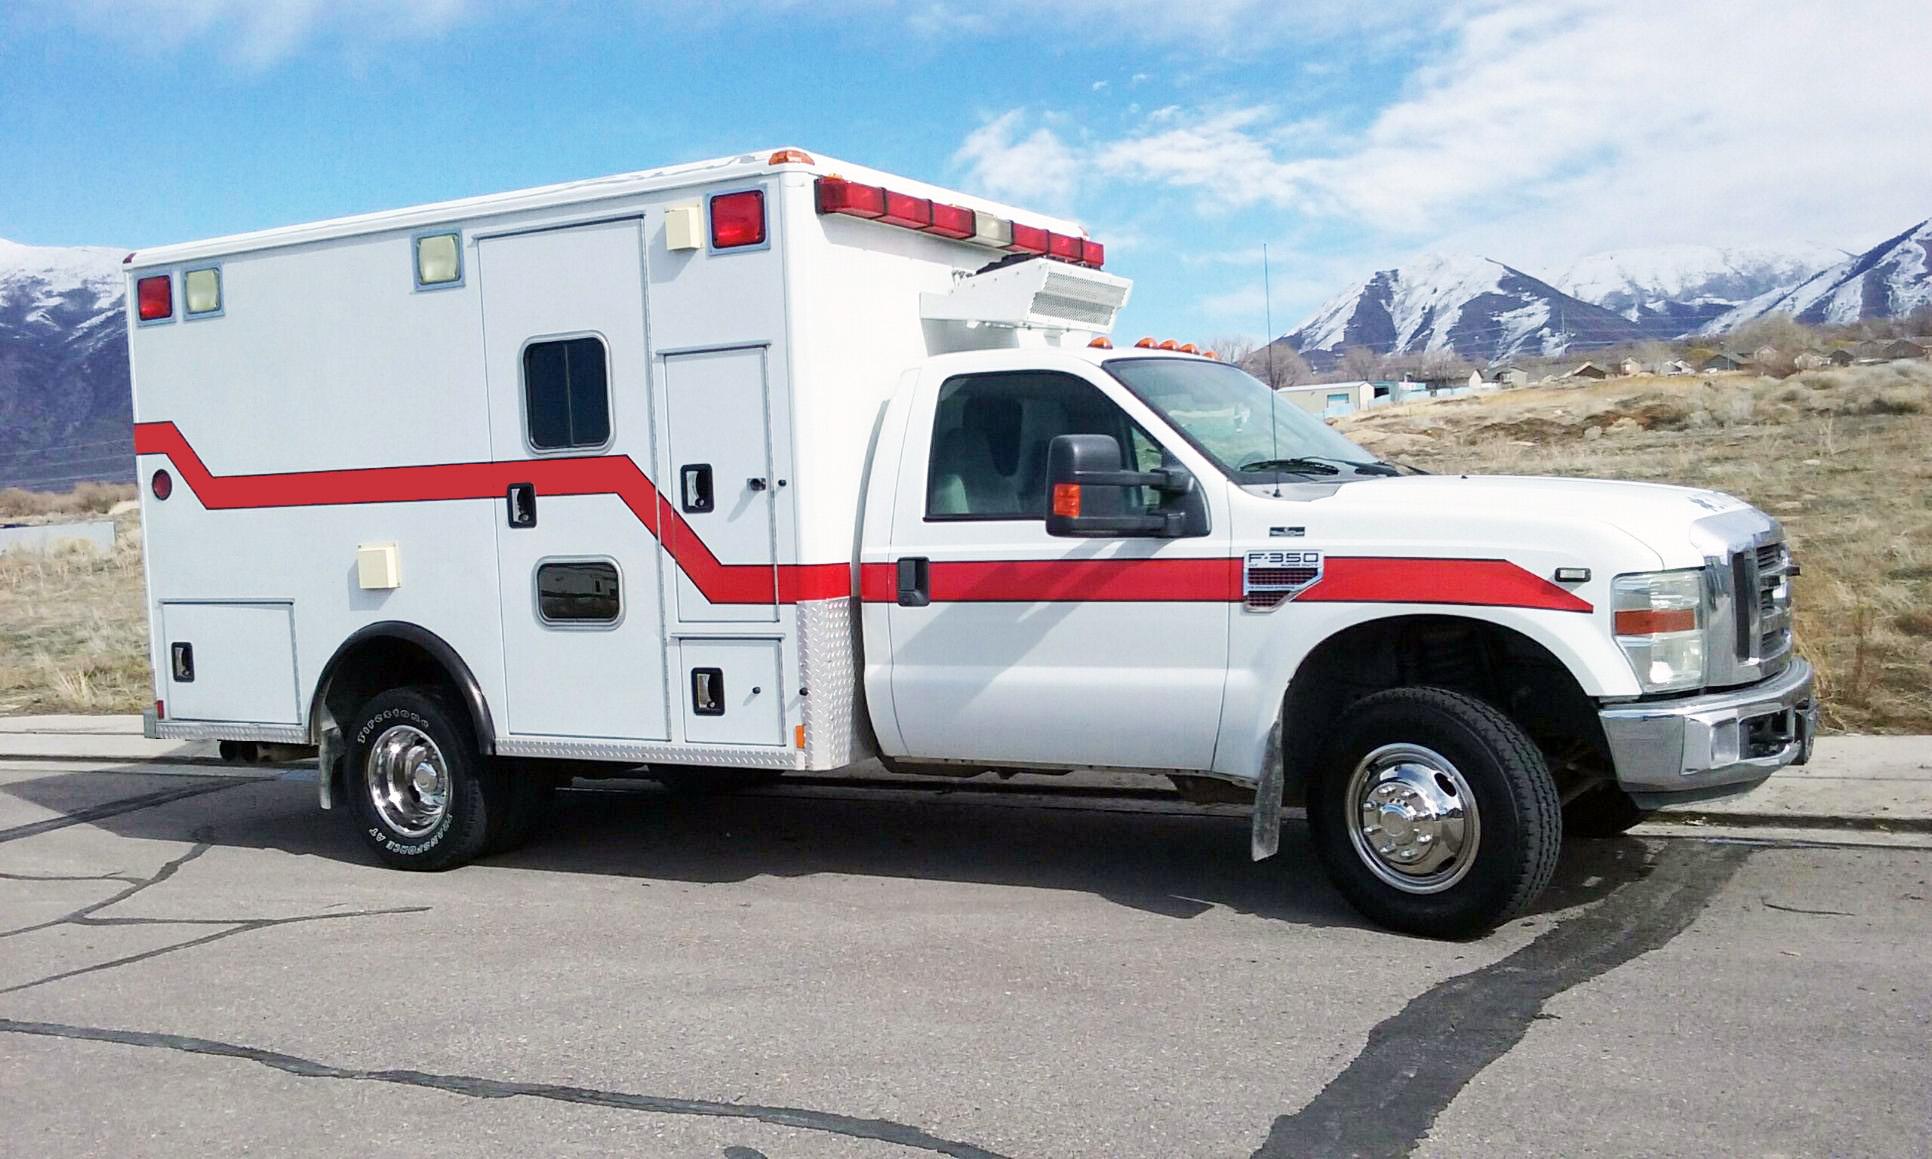 Ylh2045ld Lhd Diesel 4x4 Icu Transit Medical Clinic